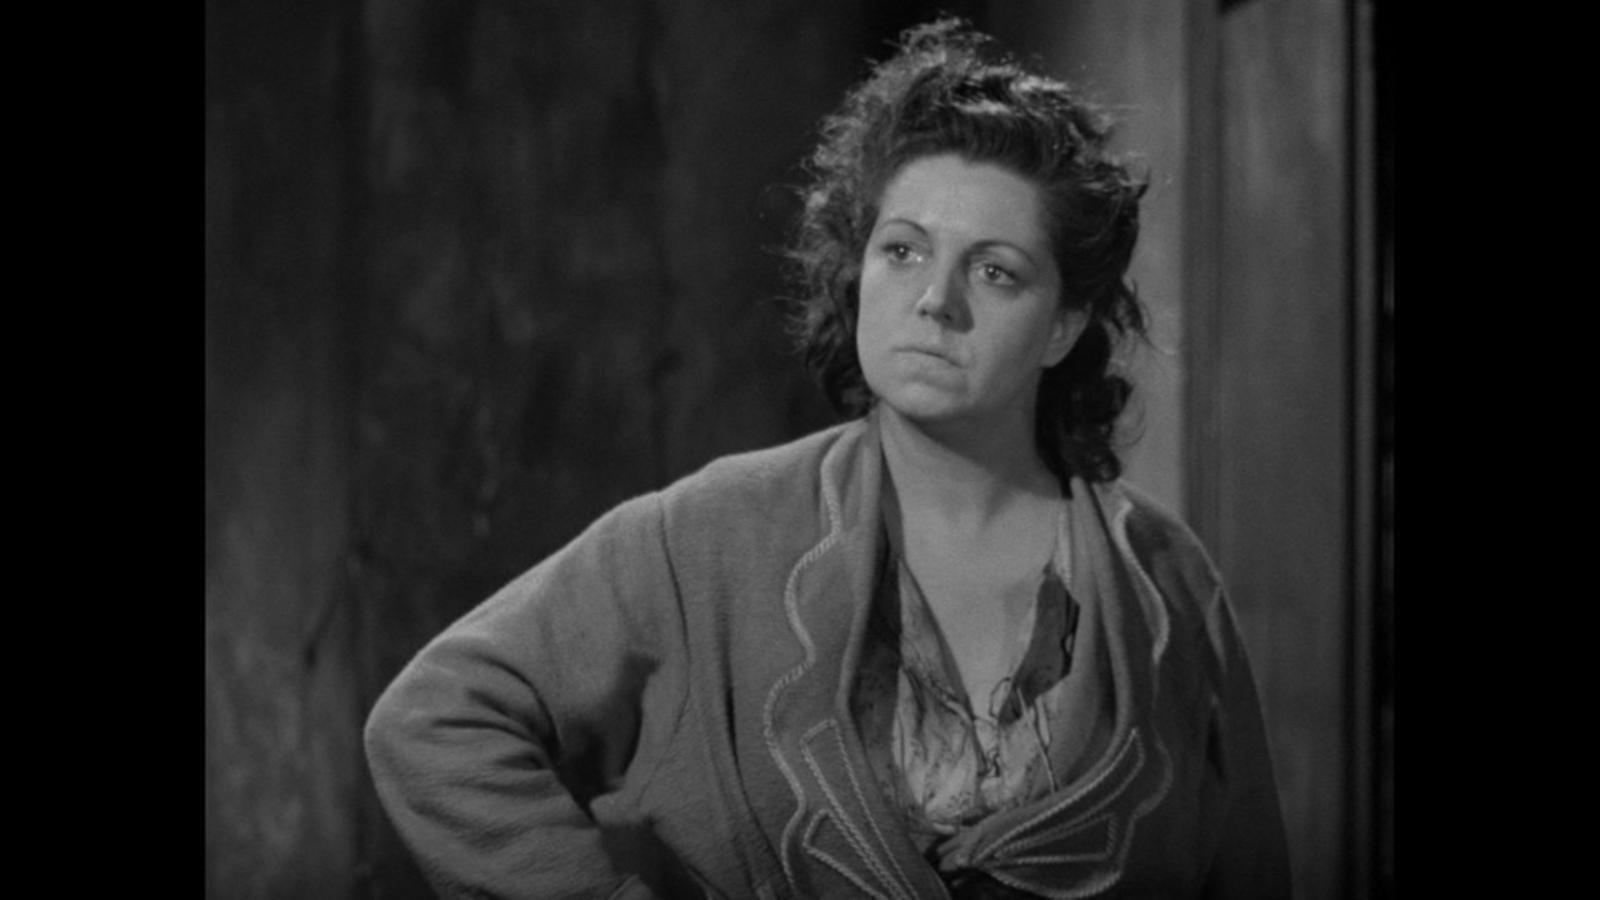 Hermione Baddeley in It Always Rains on Sunday (1947)